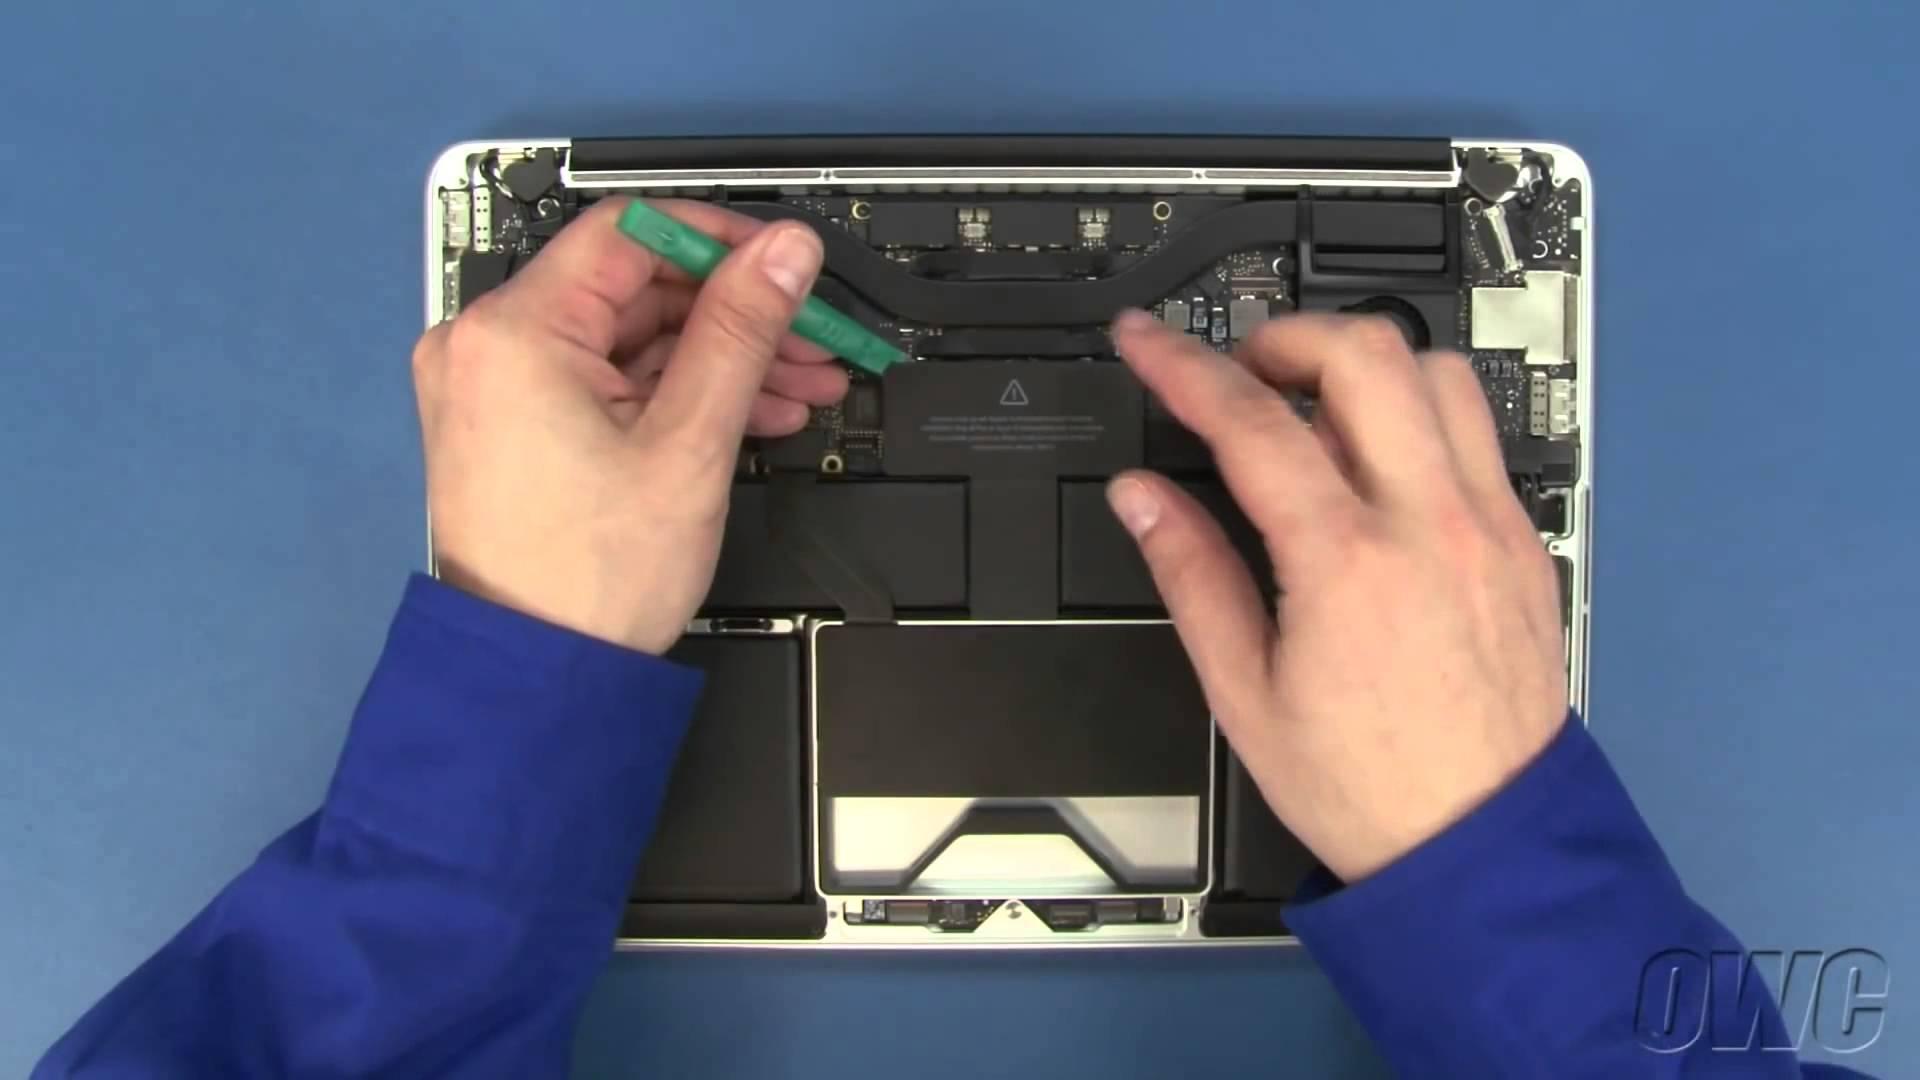 MacBook Pro 13″ Retina HDDハードディスク交換方法動画